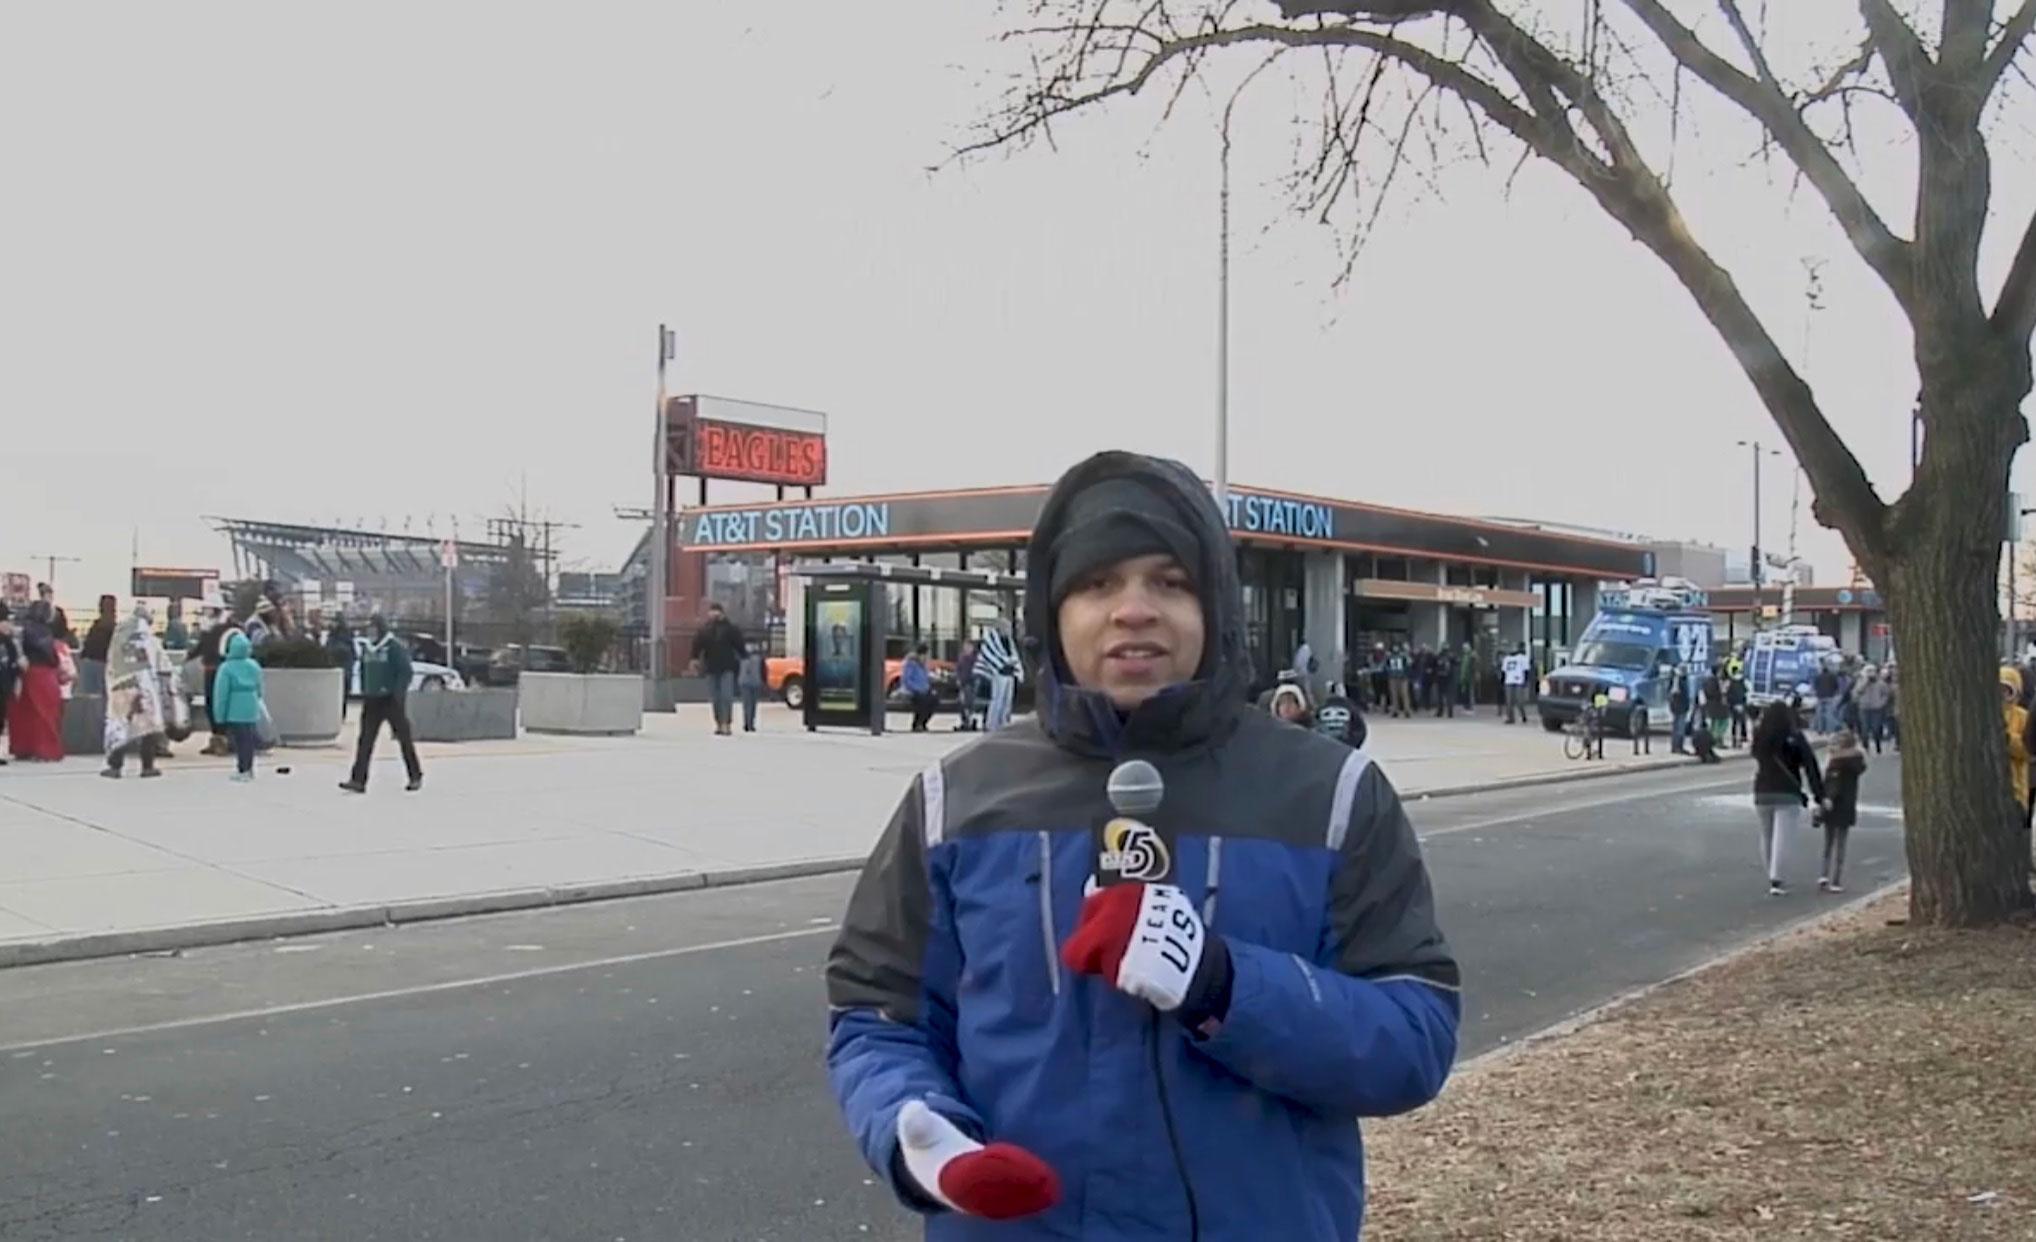 Leon Purvis reporting on the Philadelphia Eagles for Rowan University